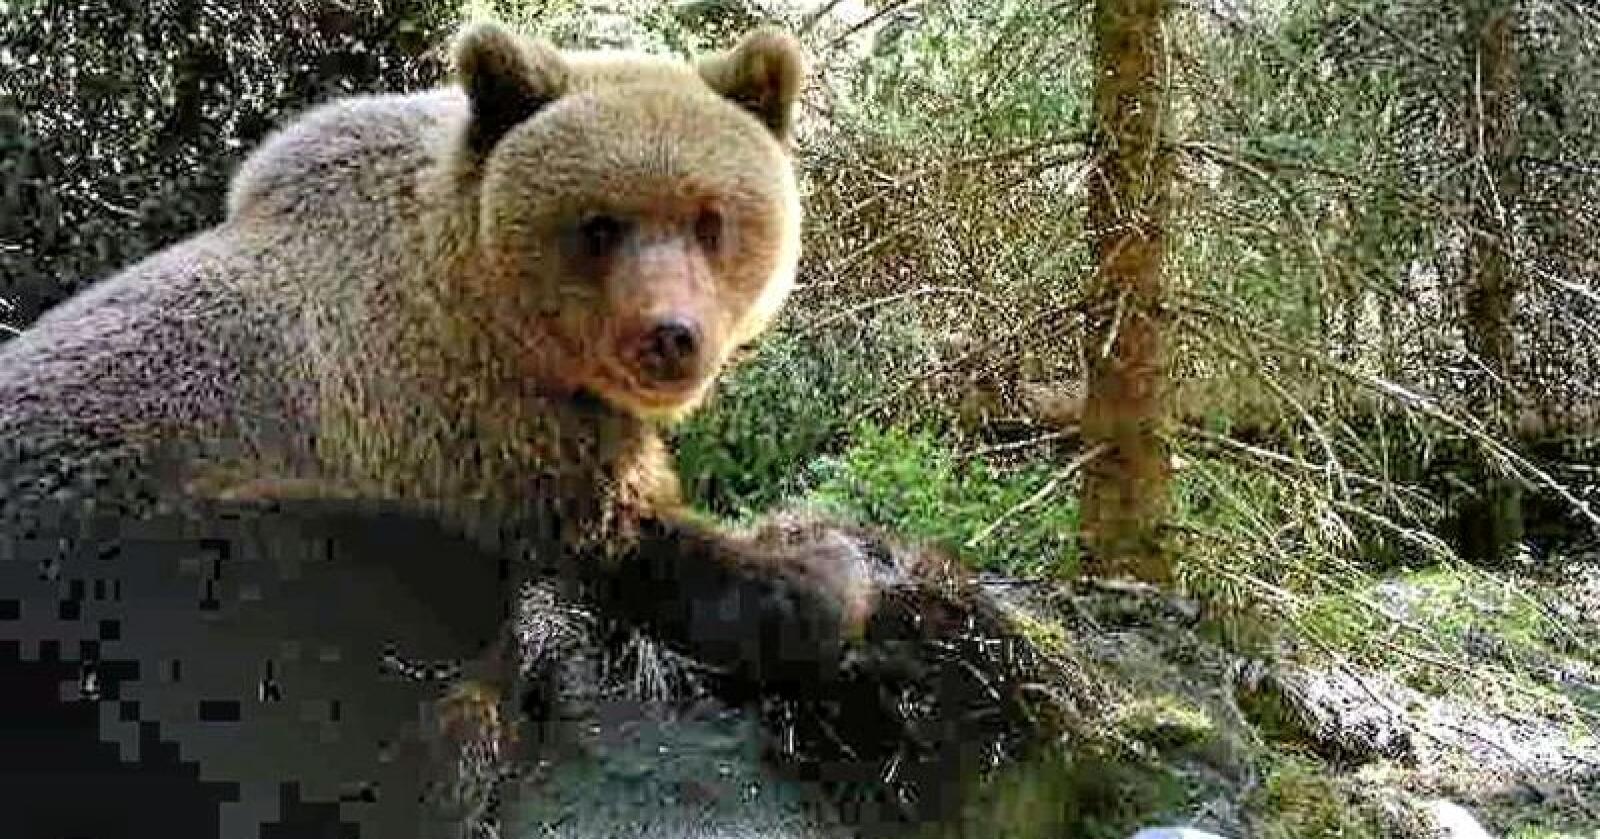 Denne bjørnen ble fotografert på viltkamera i Beitstad i Steinkjer. Foto: Viltkamera/Wiggo Oksvold